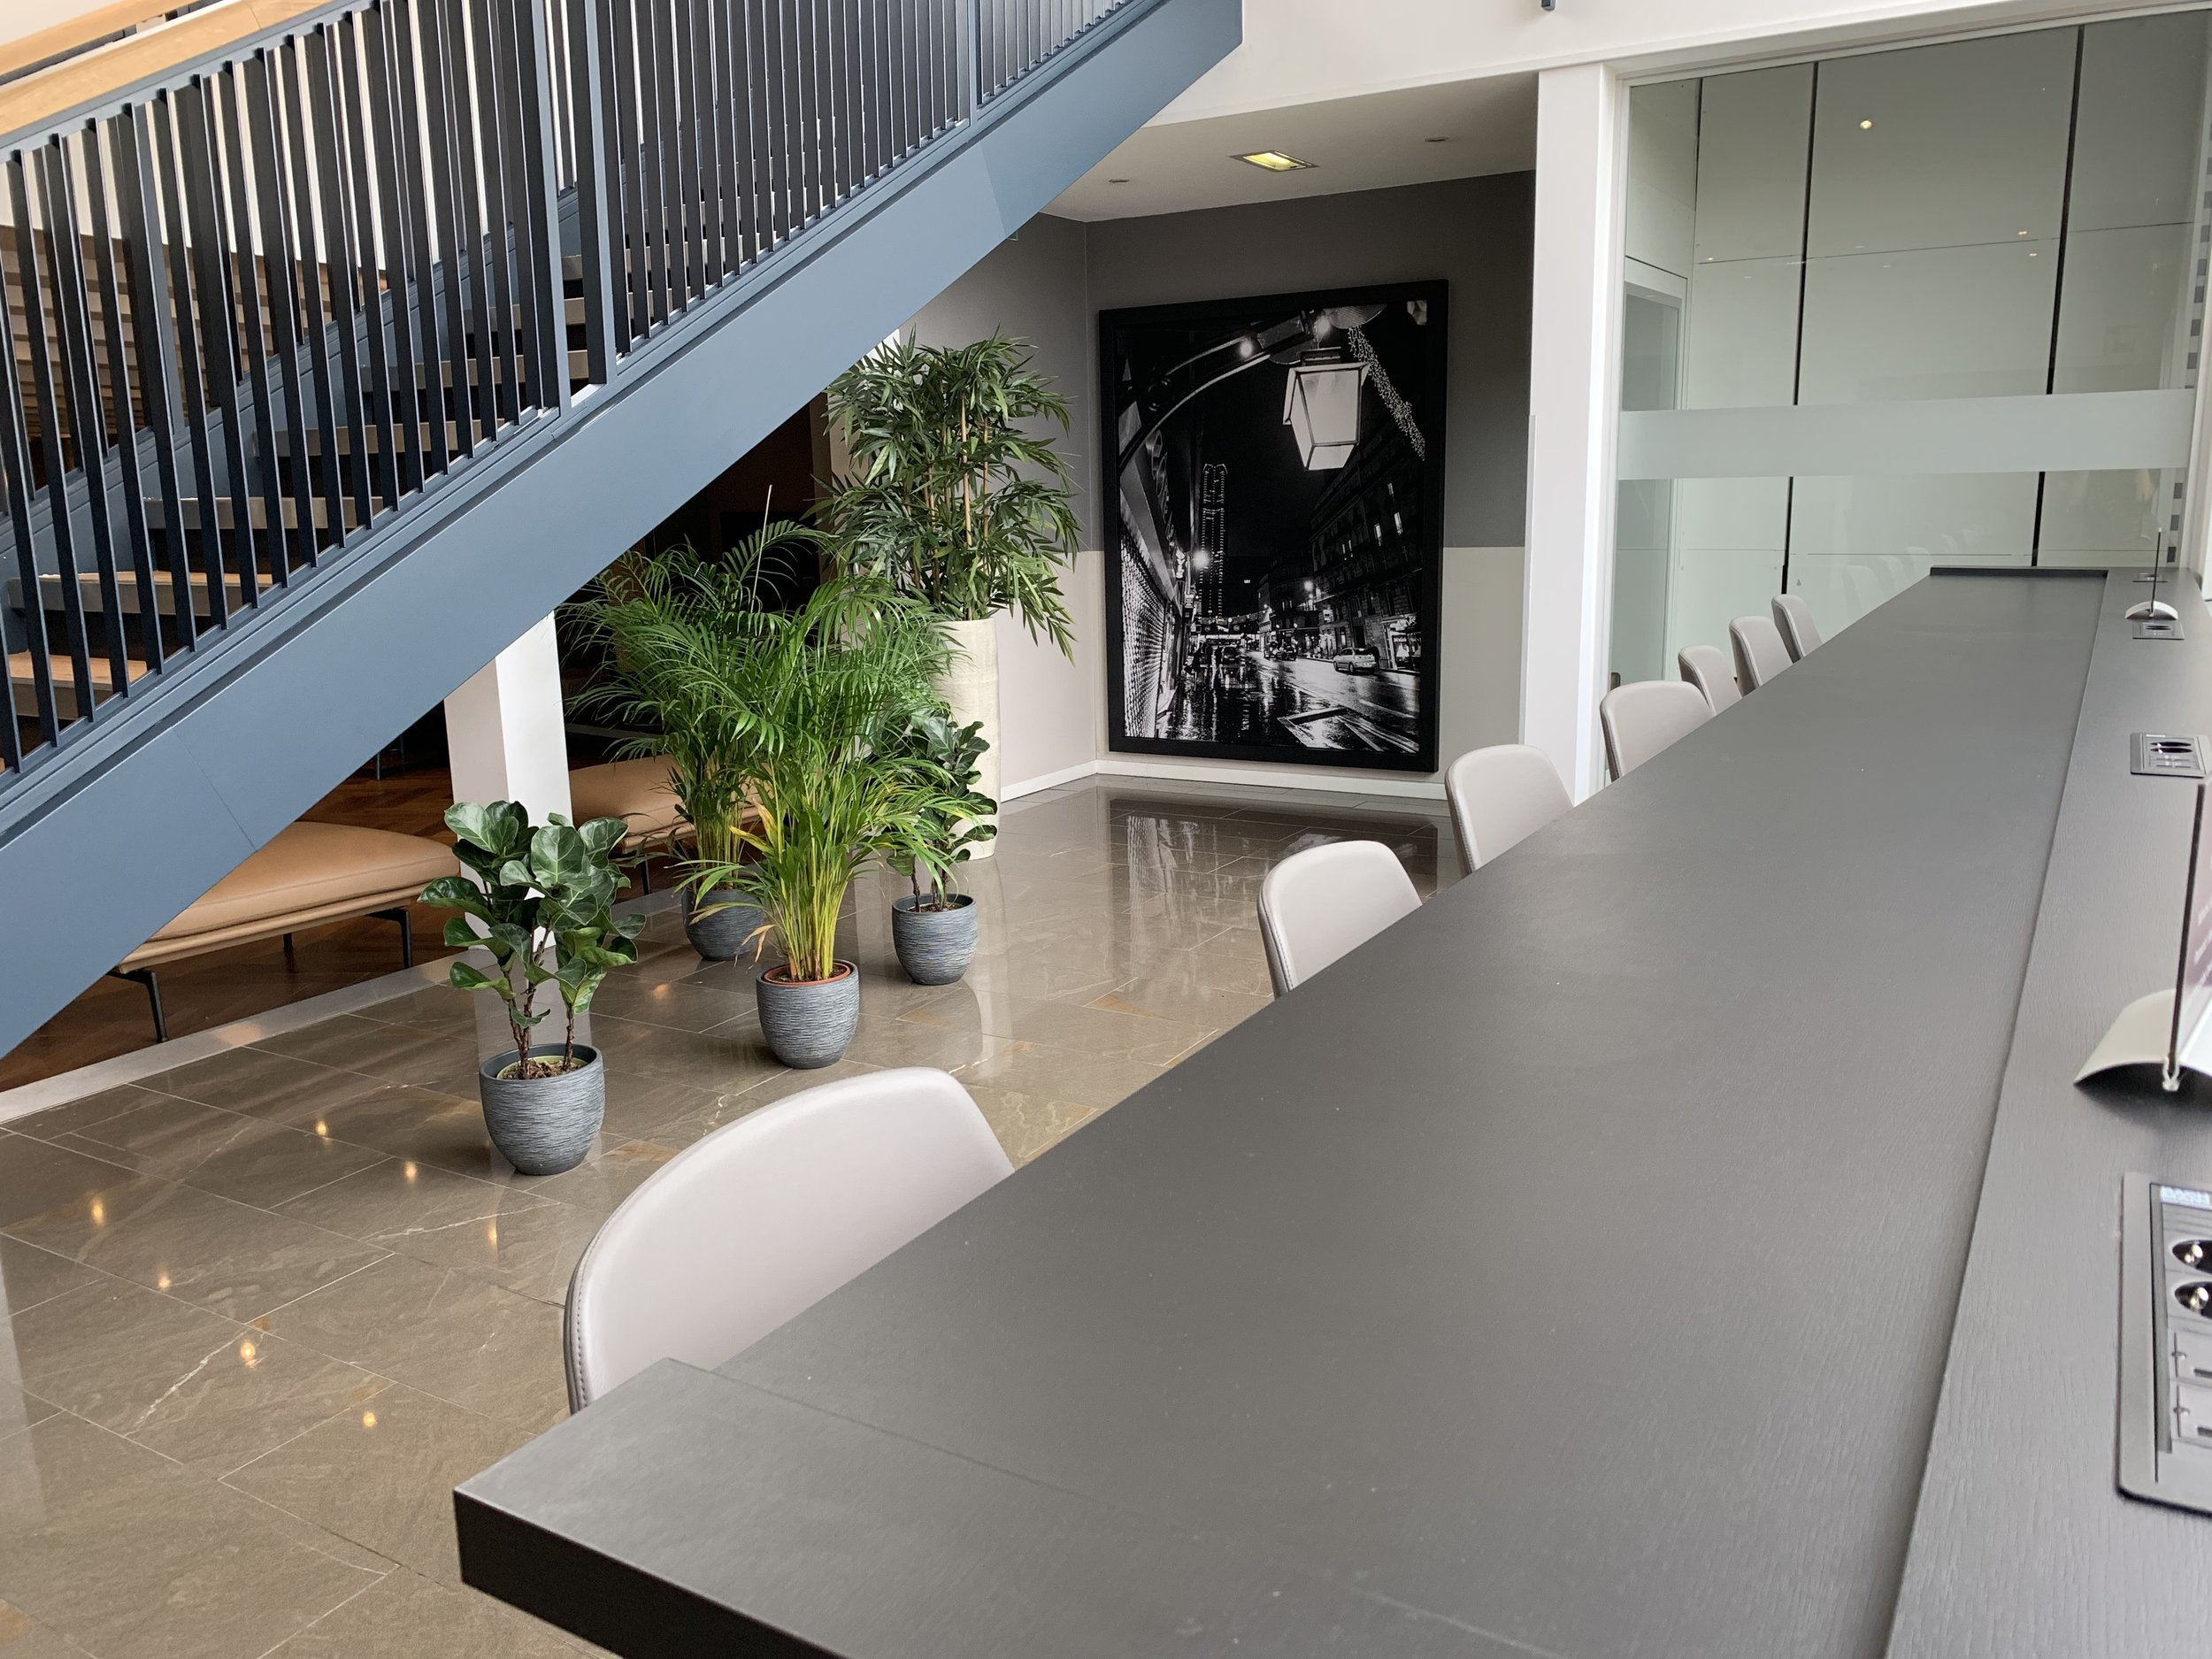 New Refurbished Star Alliance Lounge Paris Charles De Gaulle 5.jpeg